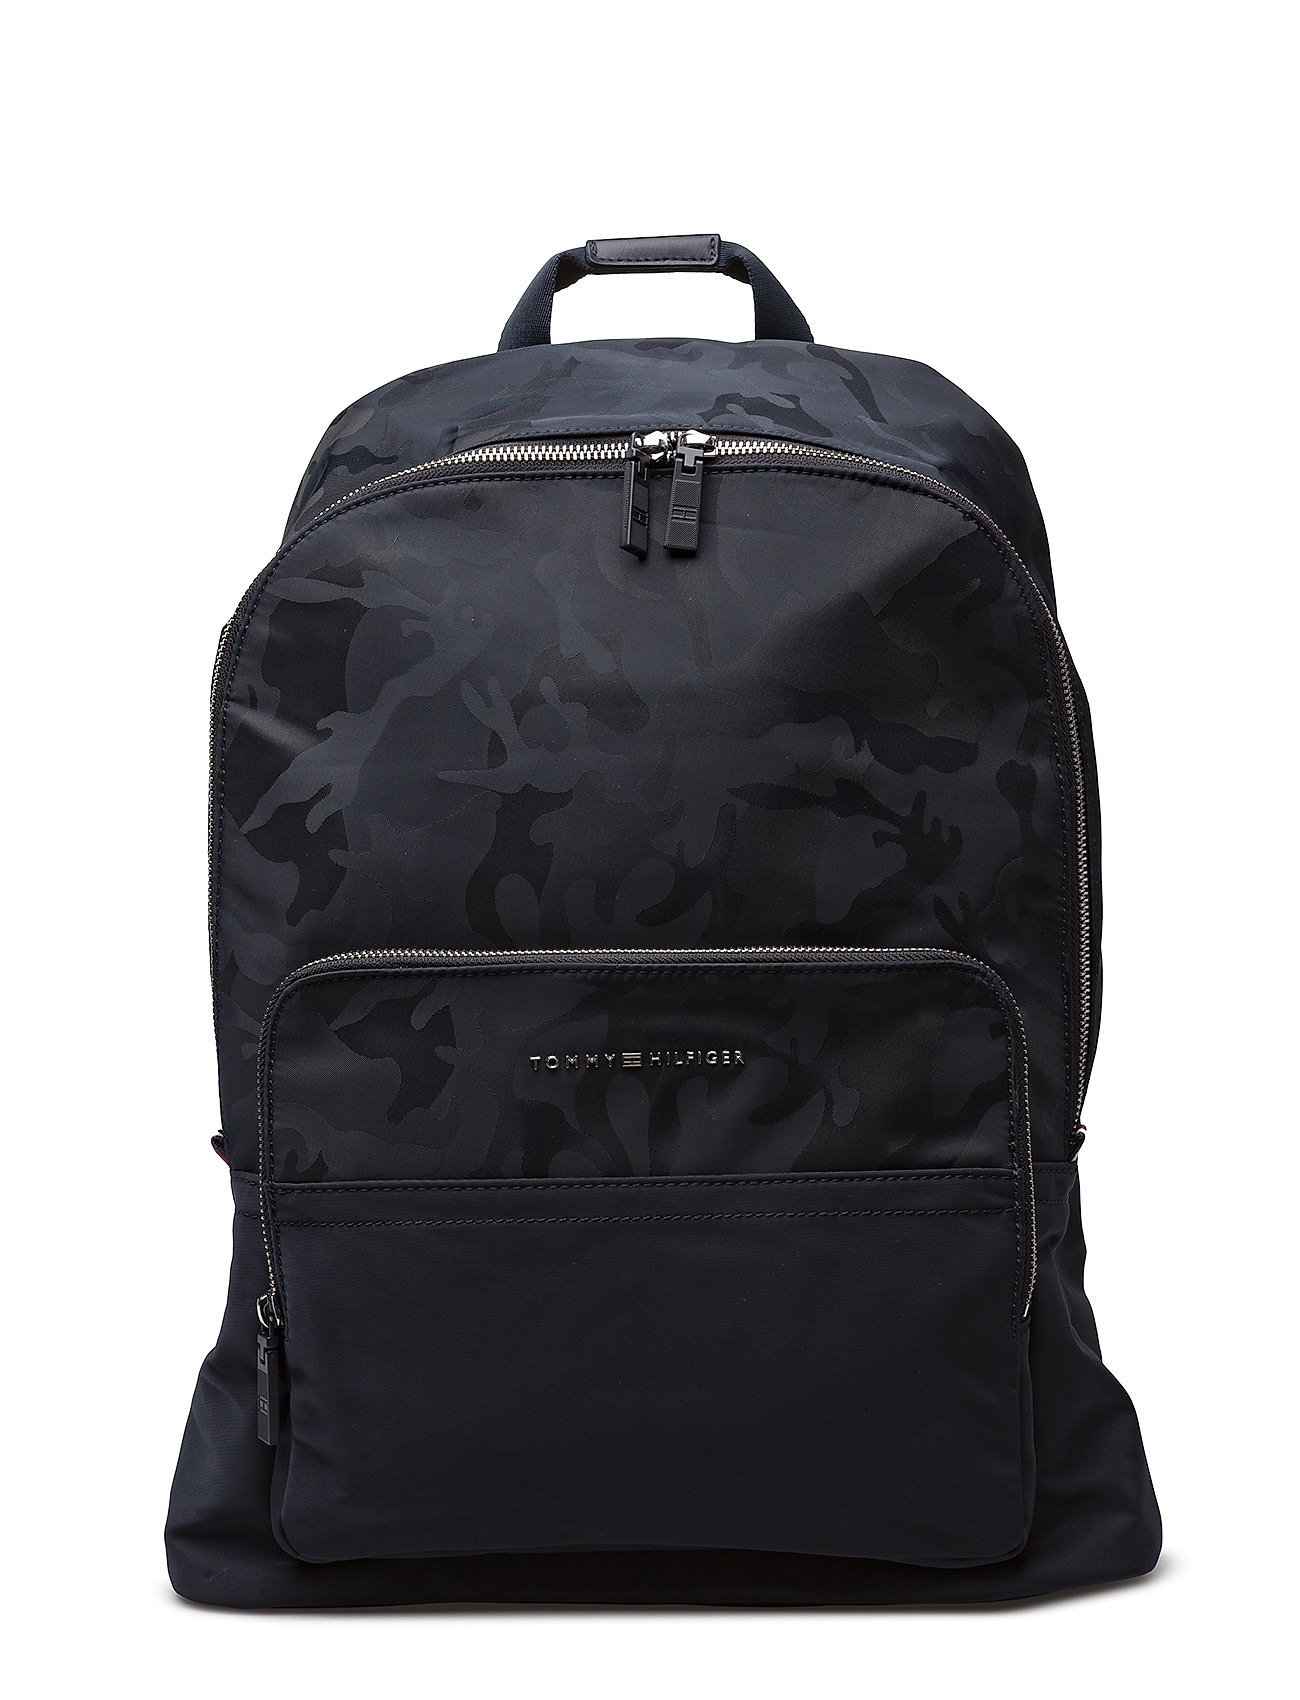 tommy hilfiger – Tailored nylon backpack fra boozt.com dk